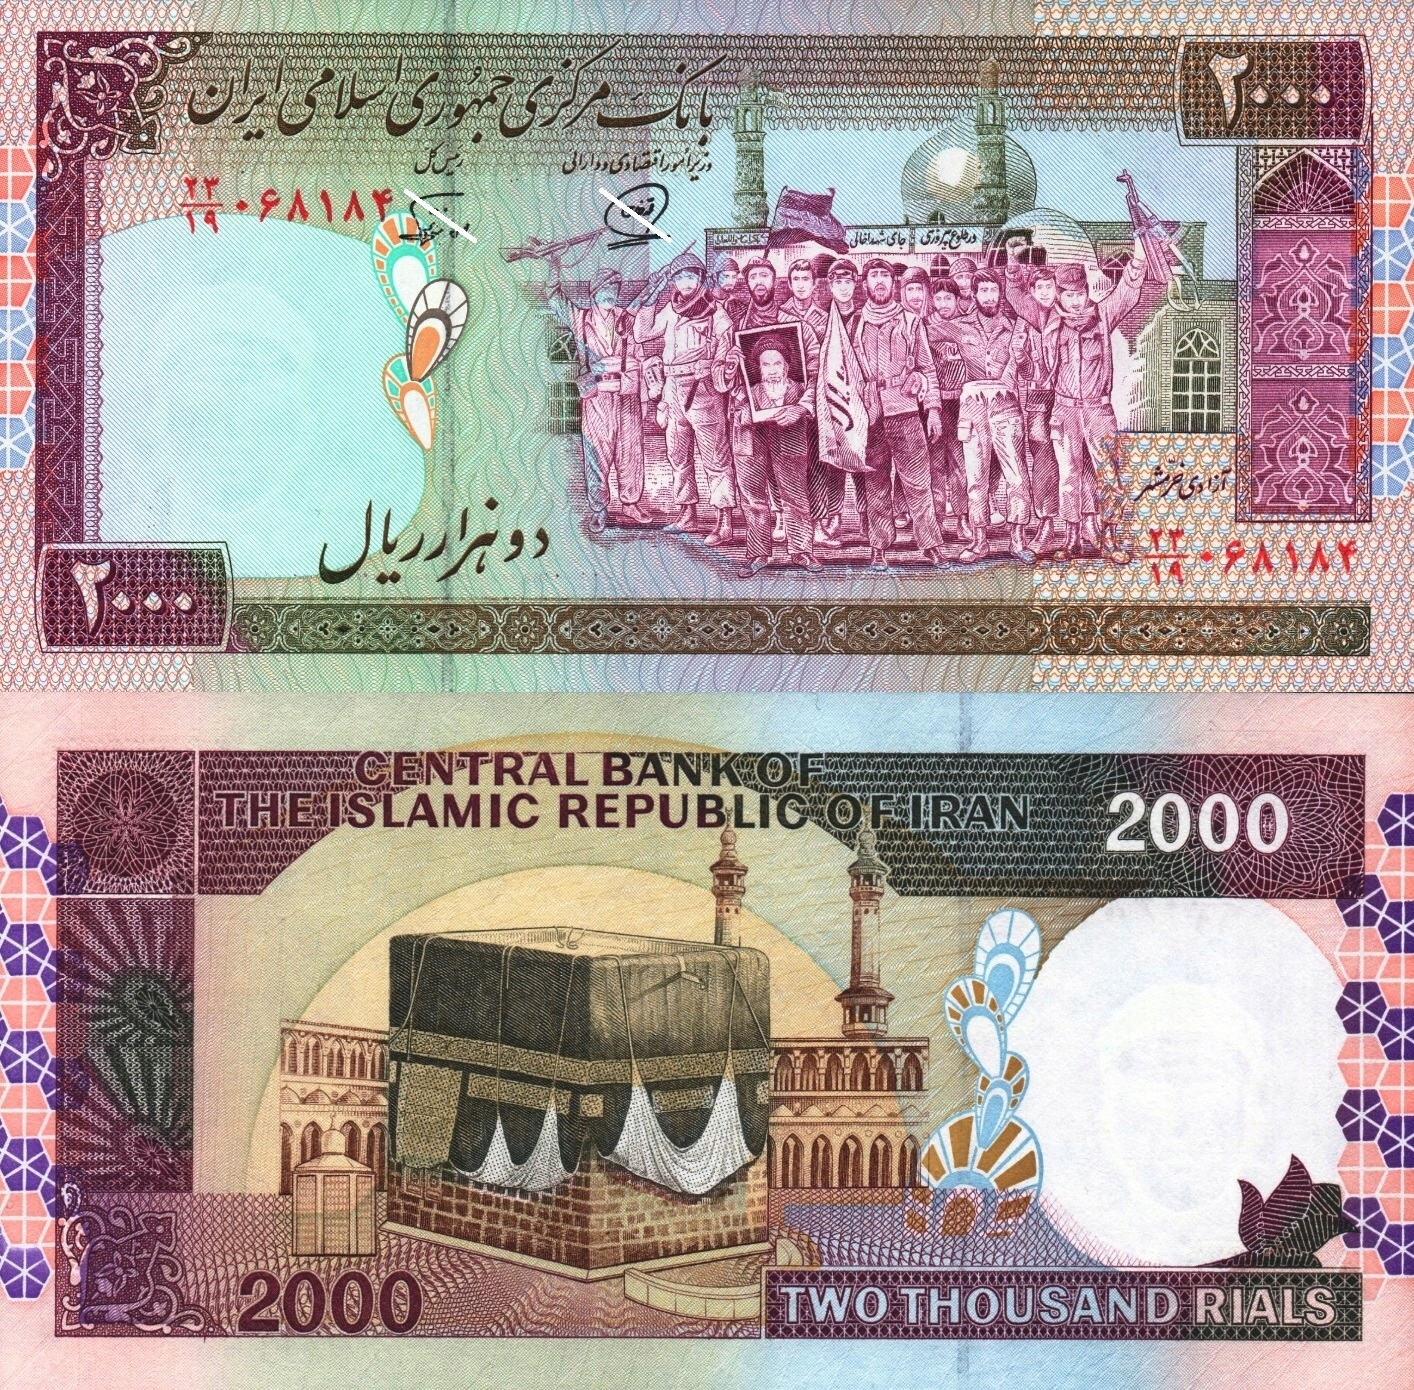 # ИРАН - 2000 РИАЛИ - 1986 - P-141k - UNC